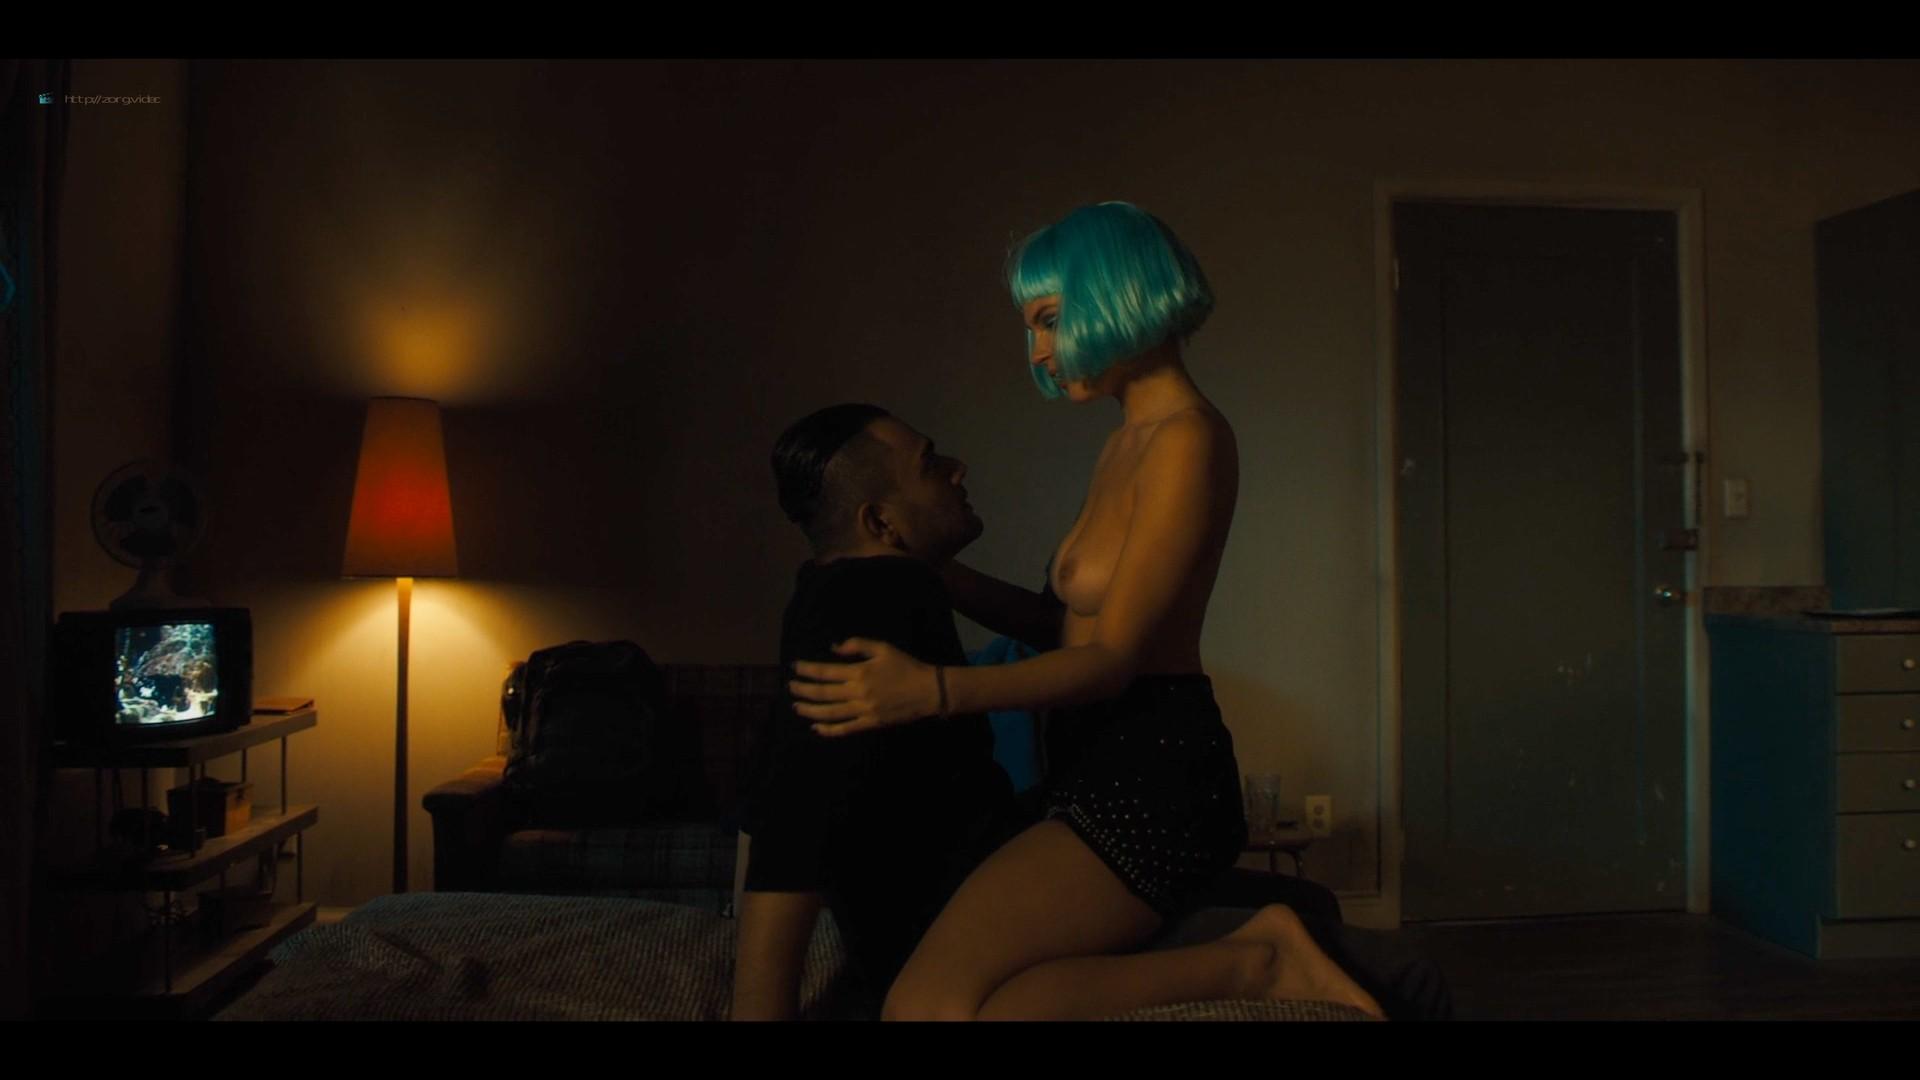 Gaite Jansen nude sex Nola Palmer nude too - Jett (2019) s1e9 HD 1080p (8)